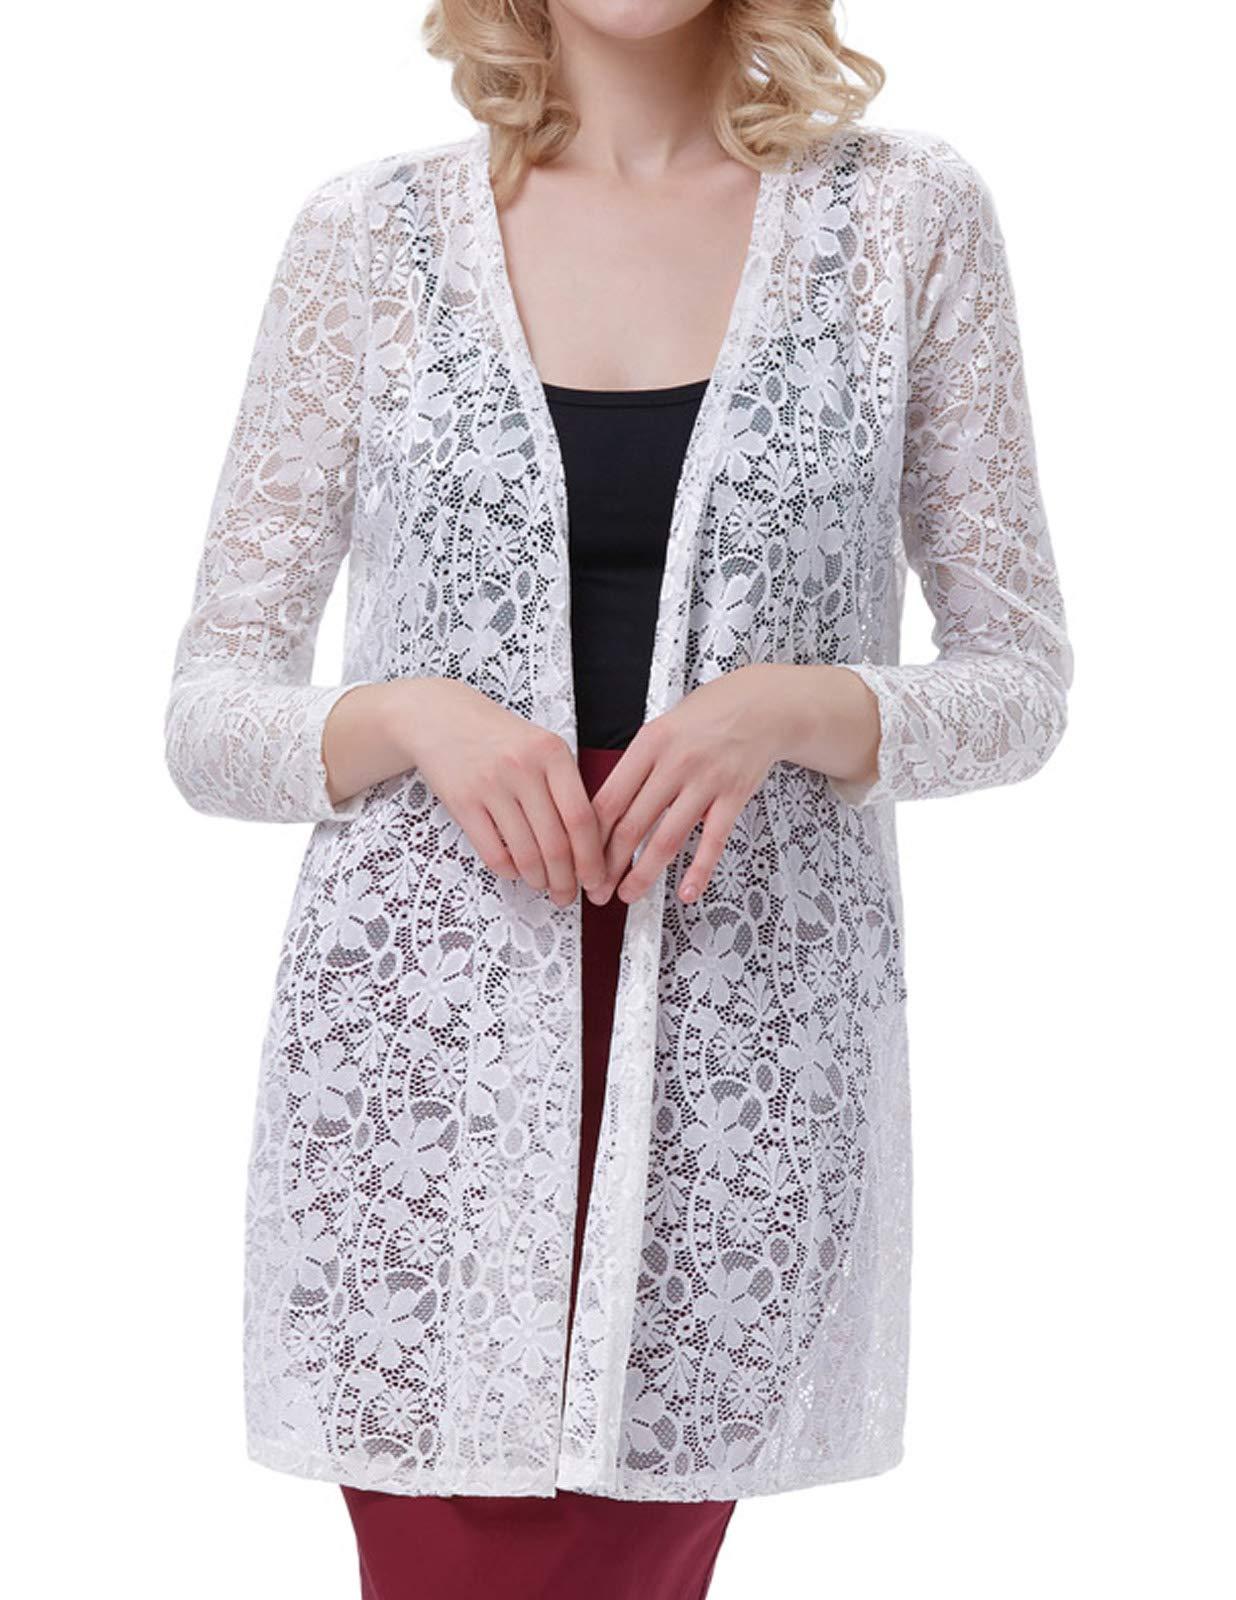 Galleon - Fancy Ladies Long Lace Drape Cardigan Jacket (S White 421-2) ff5202c8c